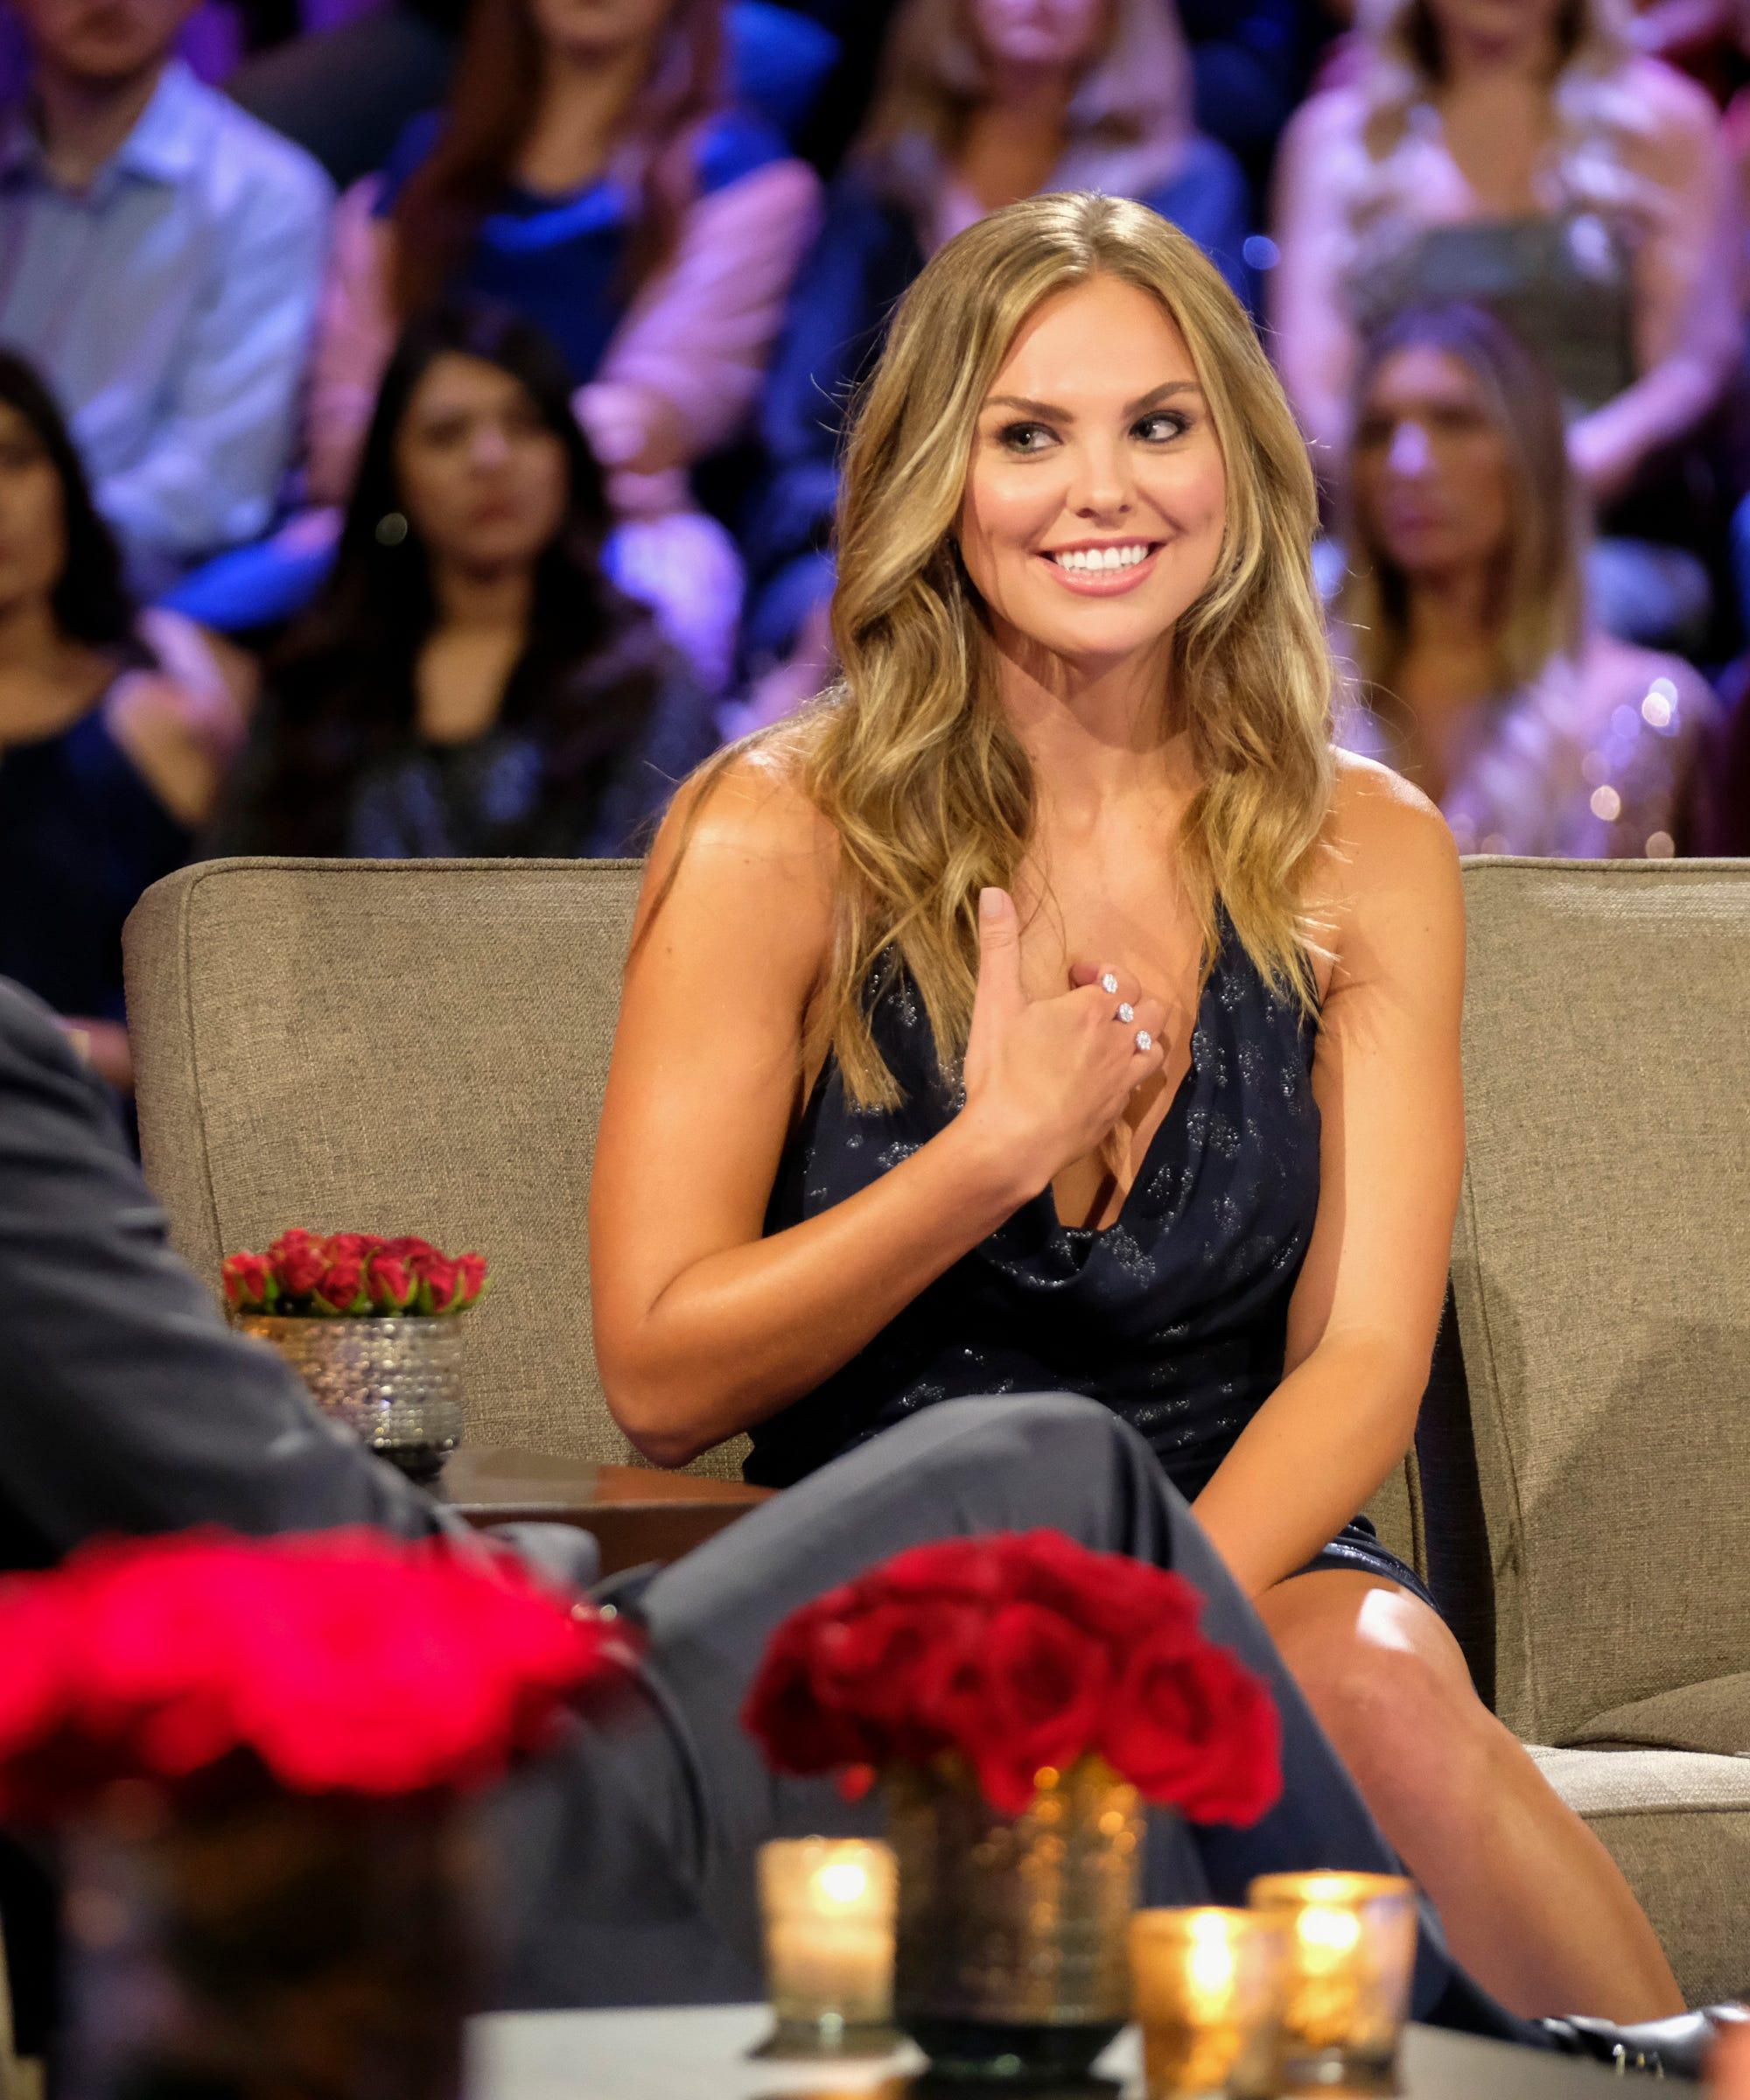 The Bachelorette Season 15, Episode 11 Recap: The Luke Show Is Finally Over